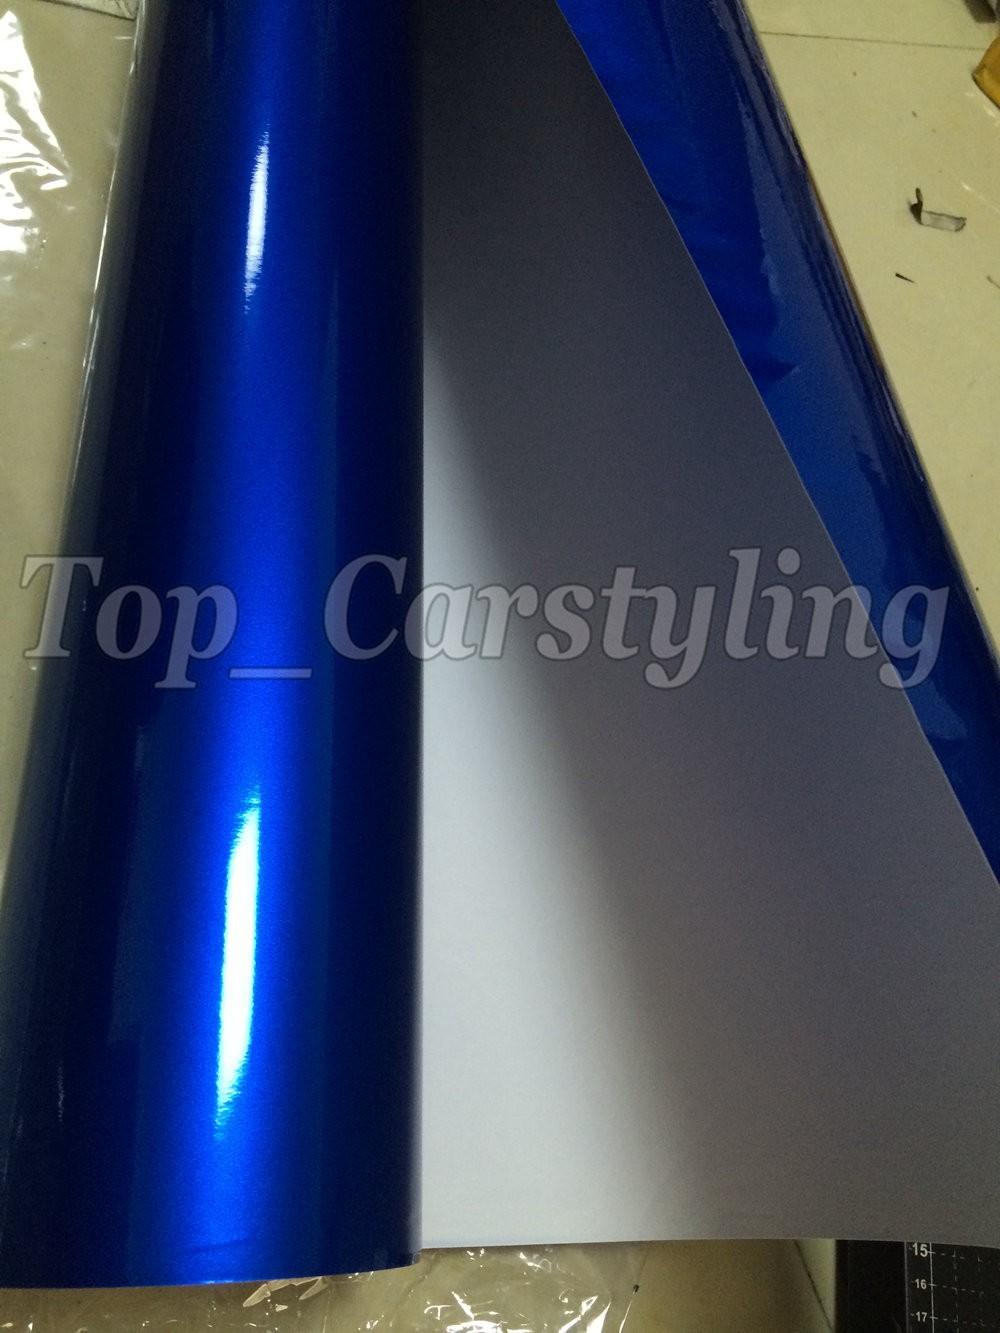 candy glossy blue metallic deep blue Shiny Car wrapping film (6)